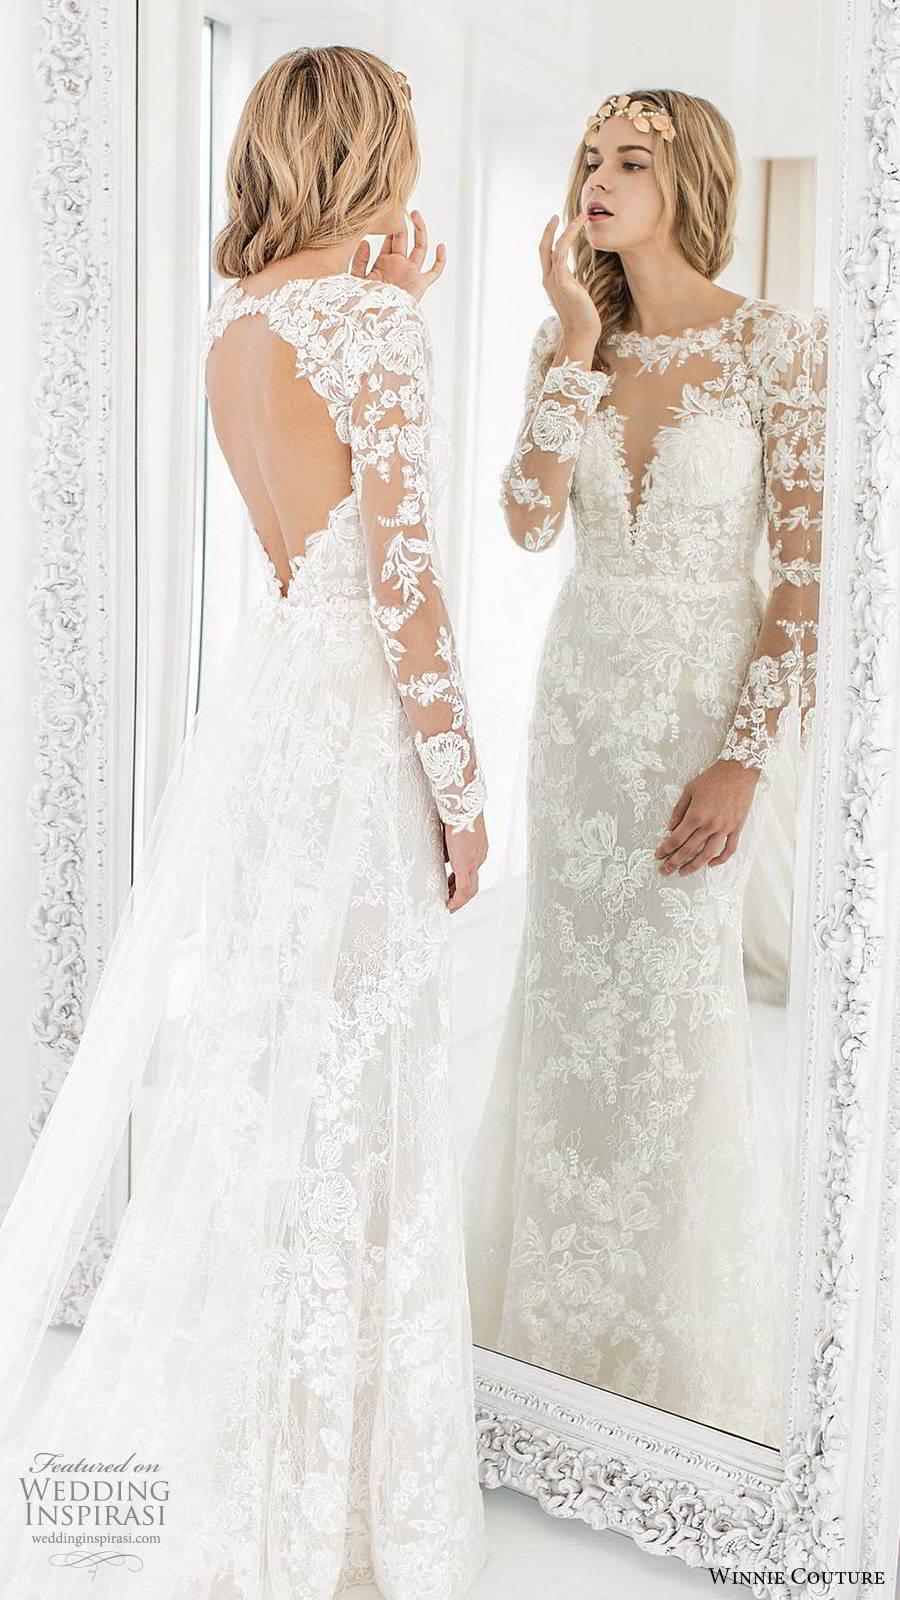 winnie couture 2019 bridal illusion long sleeves sheer bateau sweetheart neckline fully embellished lace fit flare mermaid wedding dress keyhole back chapel train (4) bv